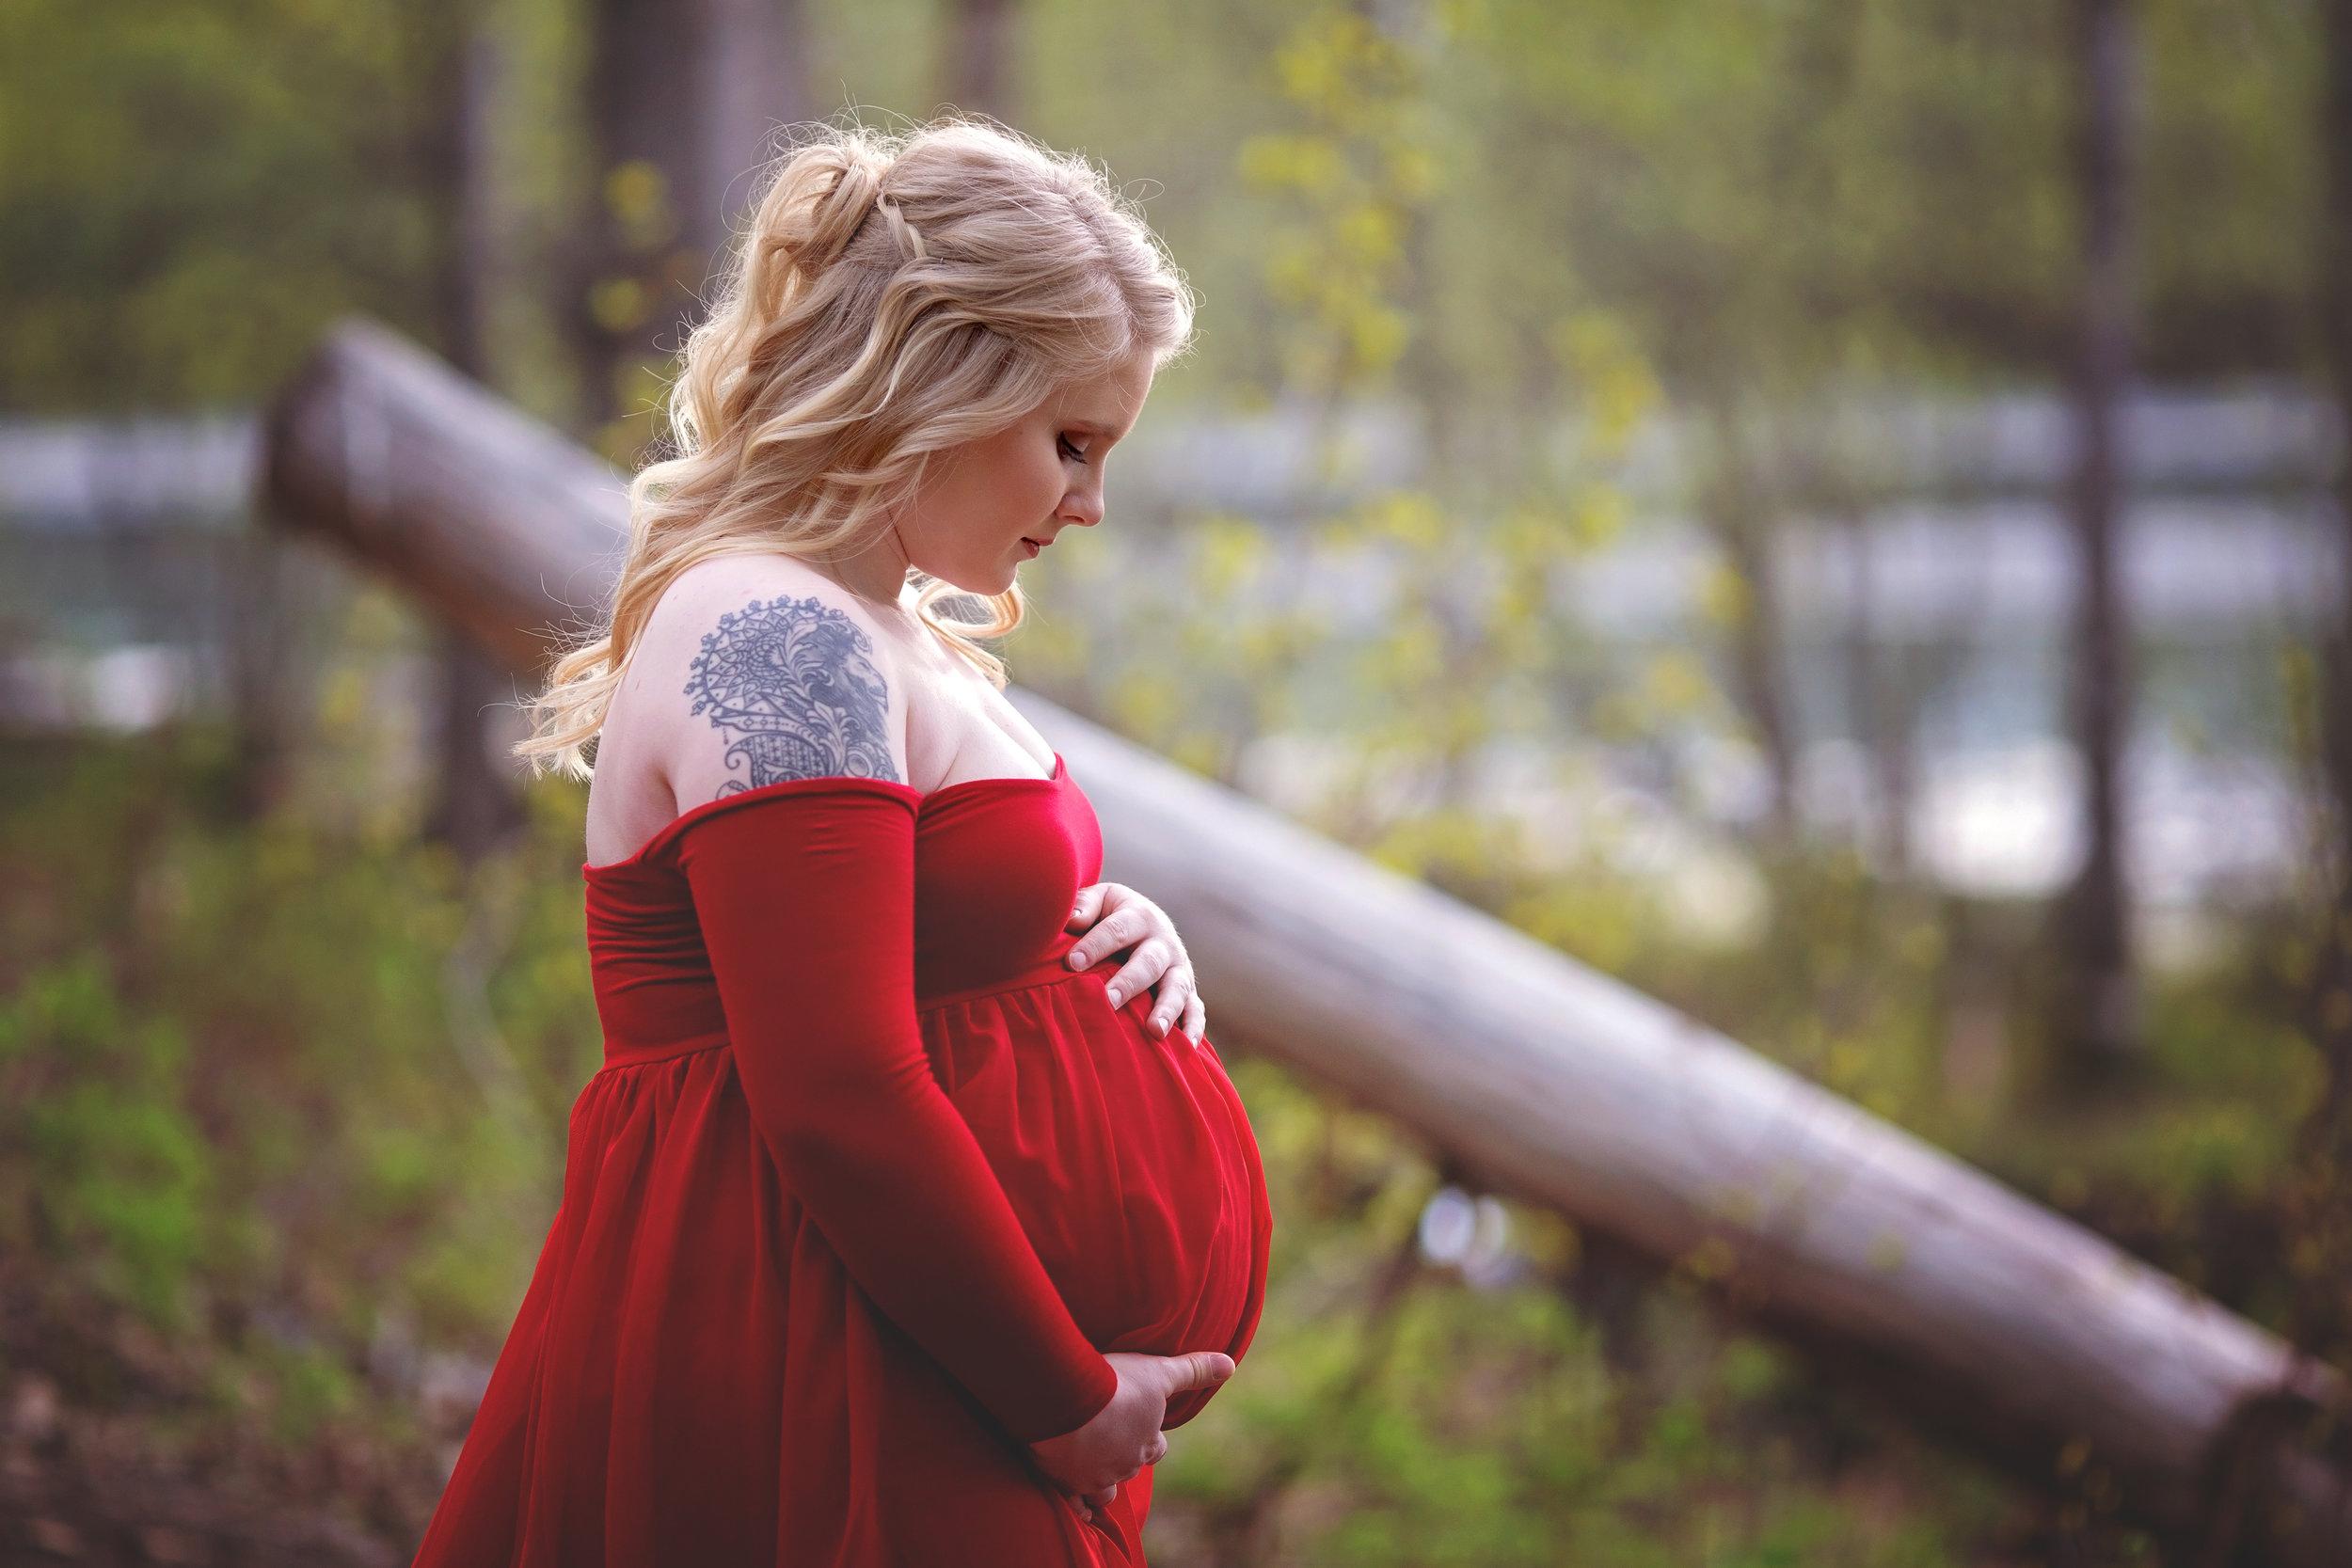 anchorage-maternity-photographer-1.jpg